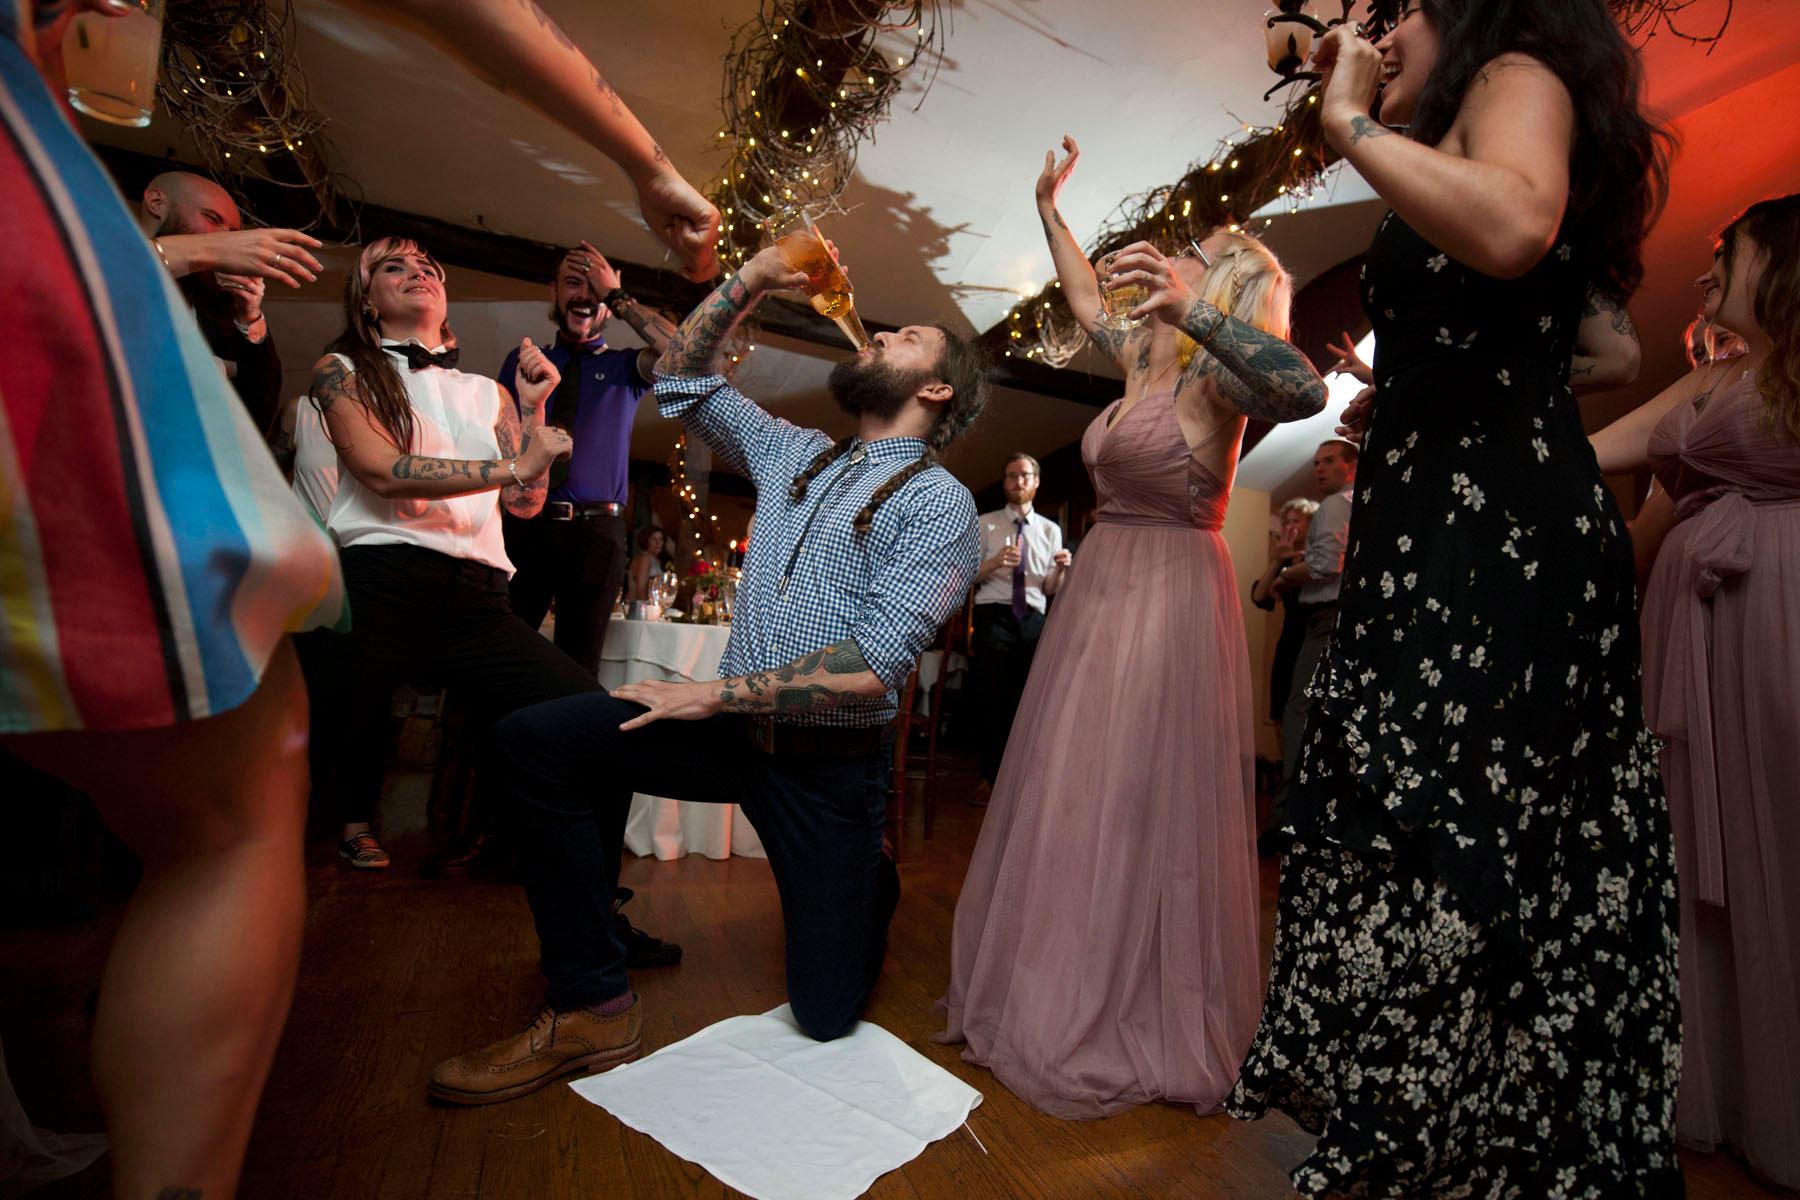 Bucks_County_wedding_photographer_Stroudsmoor_country_inn_wedding_Philadelphia_wedding_photographer_35_chug_on_the_dance_floor.JPG